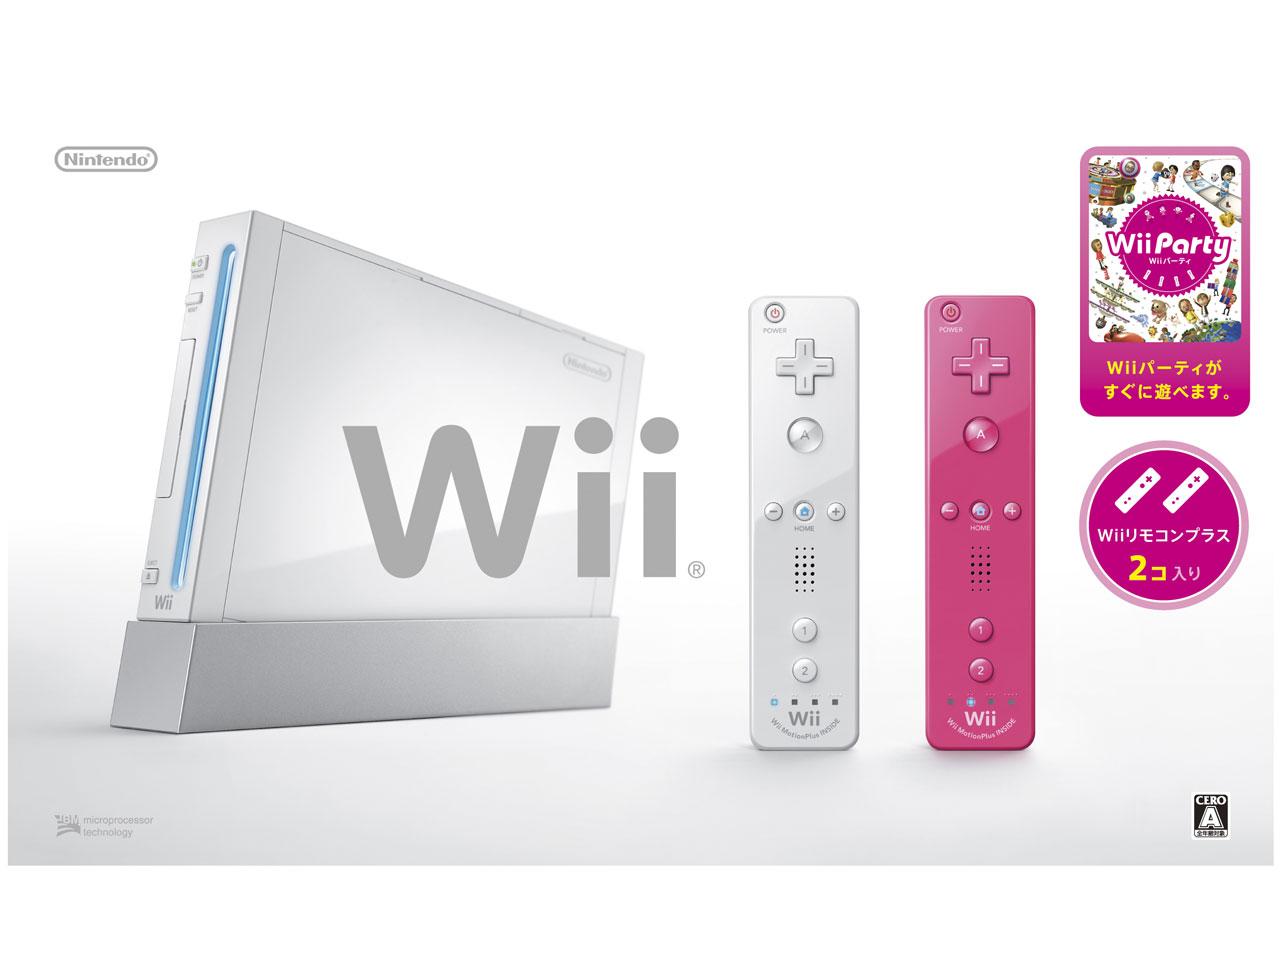 Wii [ウィー] シロ [Wiiリモコンプラス・Wiiパーティ同梱] [数量限定パック]